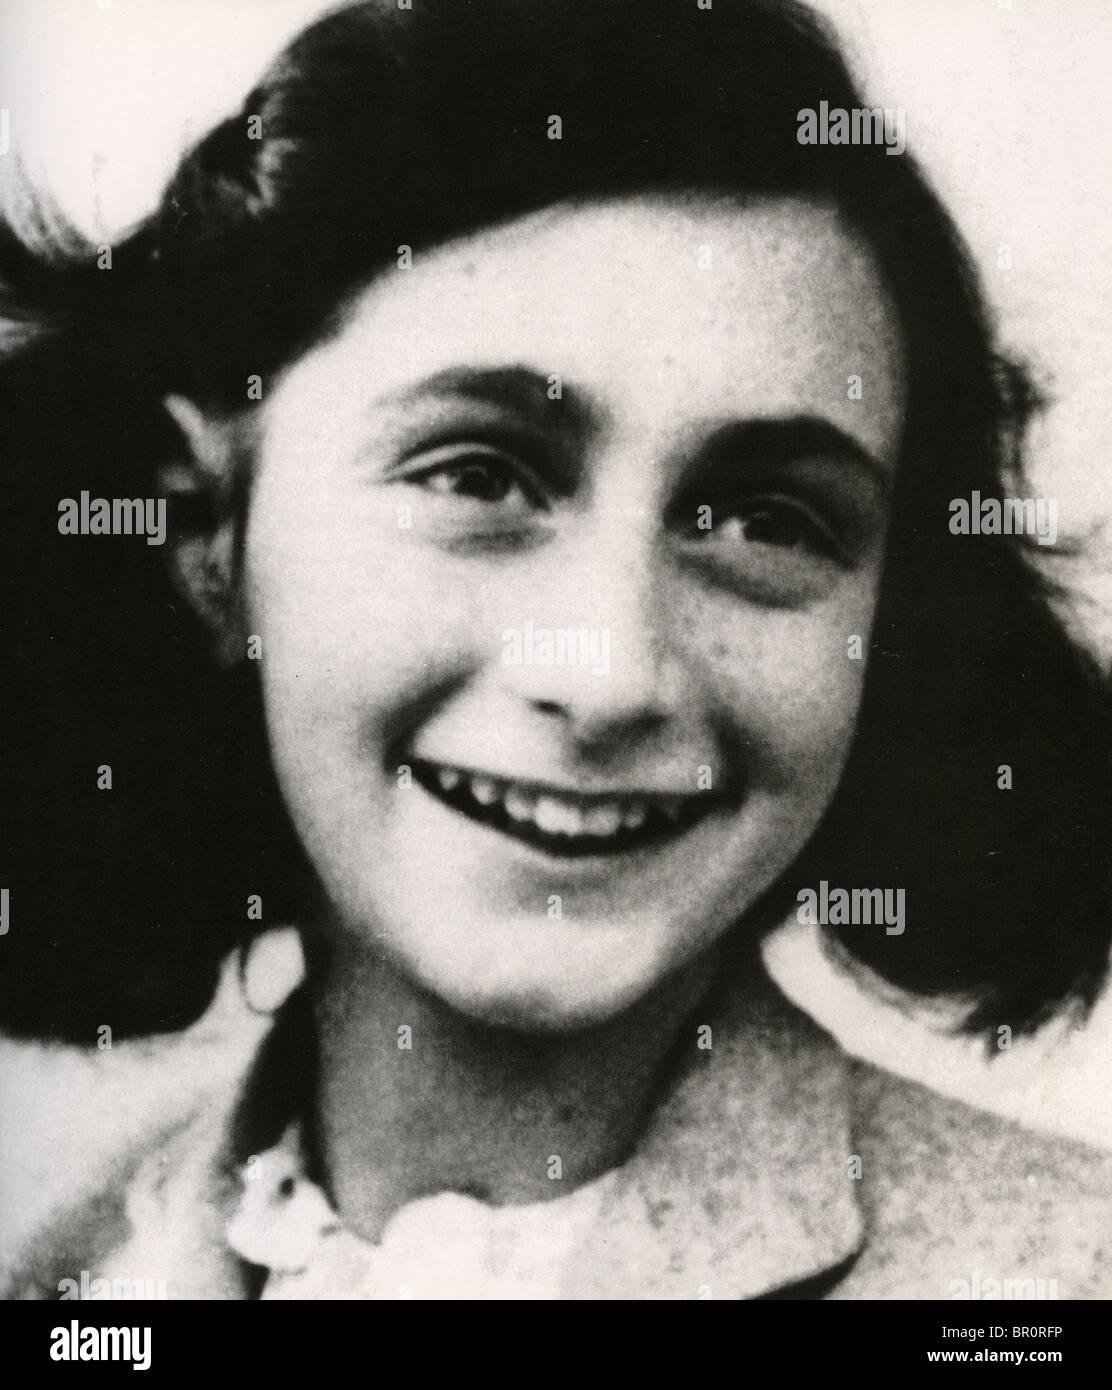 ANNE Frank (1929-1945) Holandés judío víctima del Holocausto Imagen De Stock